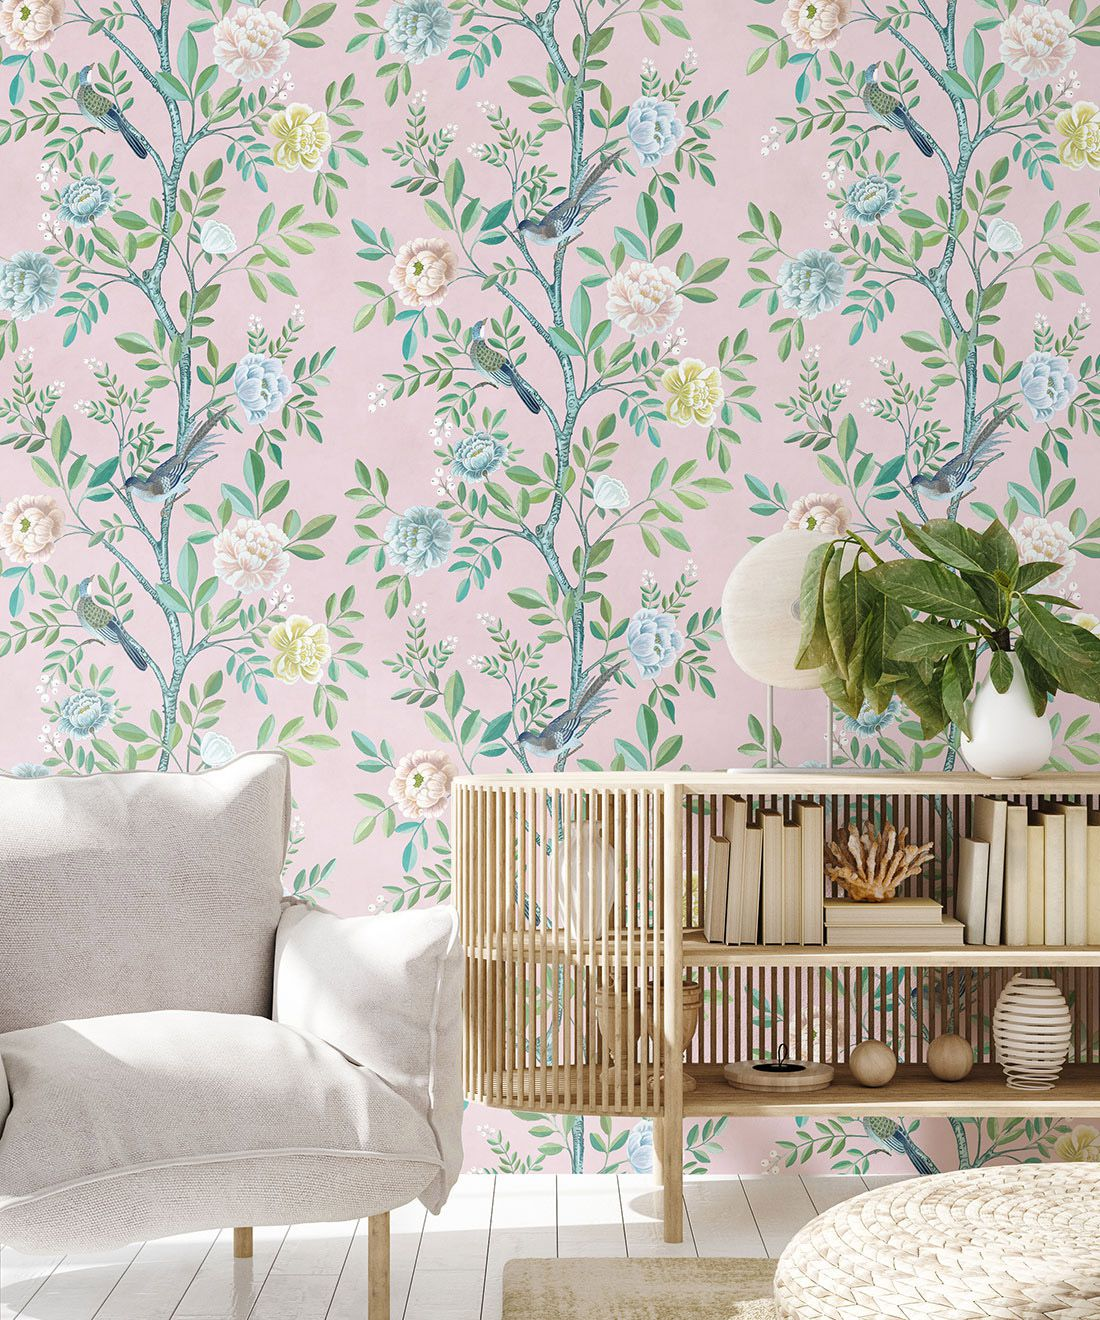 Chinoiserie Wallpaper •Floral Wallpaper •Bird Wallpaper • Magnolia • Blush • Insitu